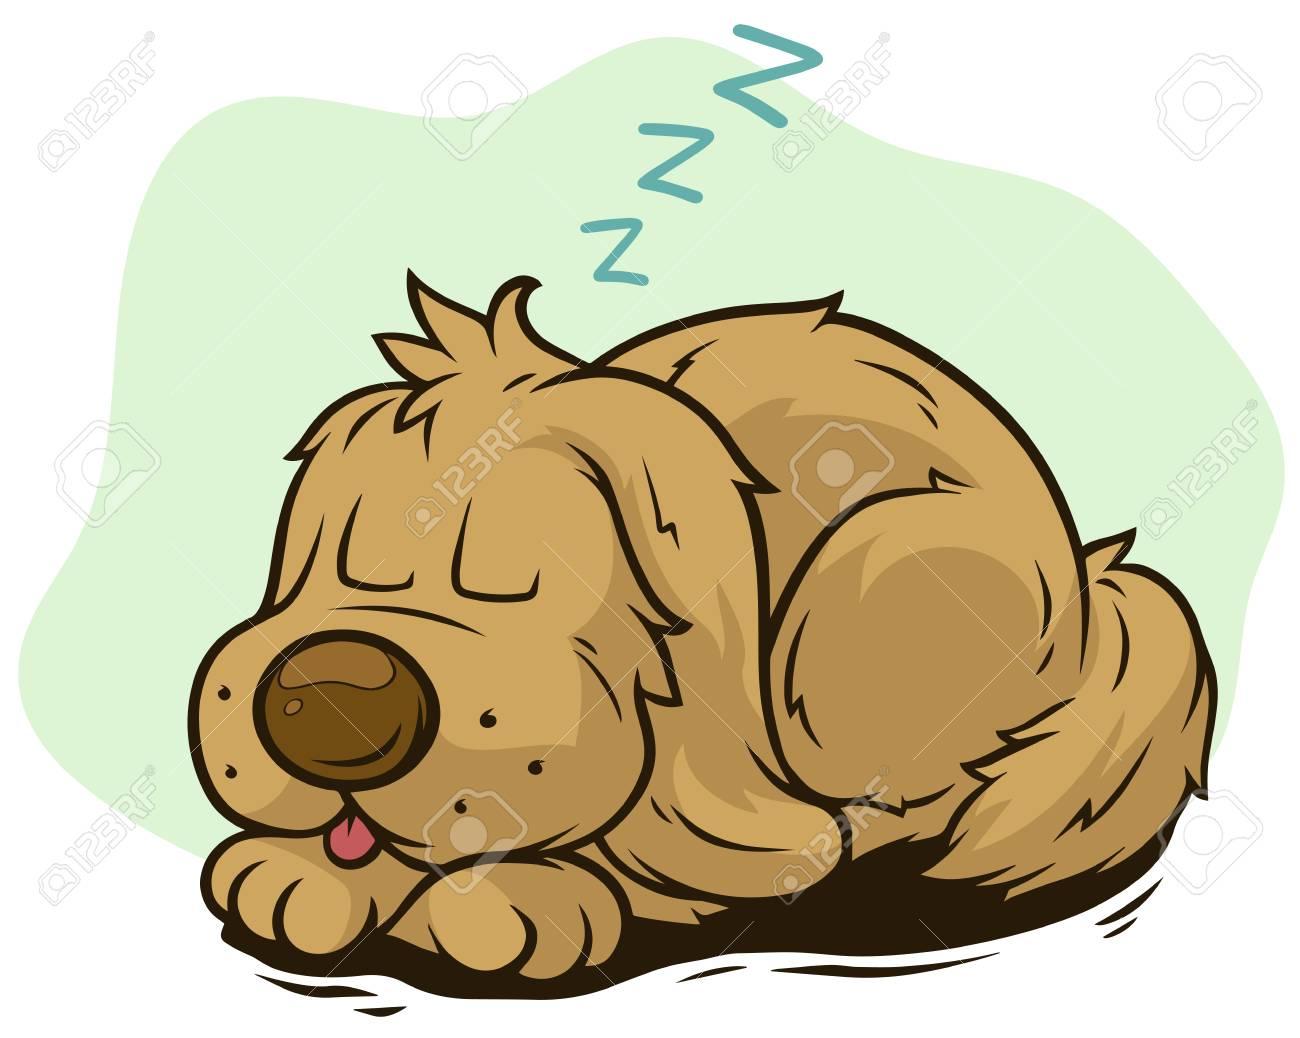 hight resolution of cartoon cute sleeping dog showing tongue stock vector 101808561